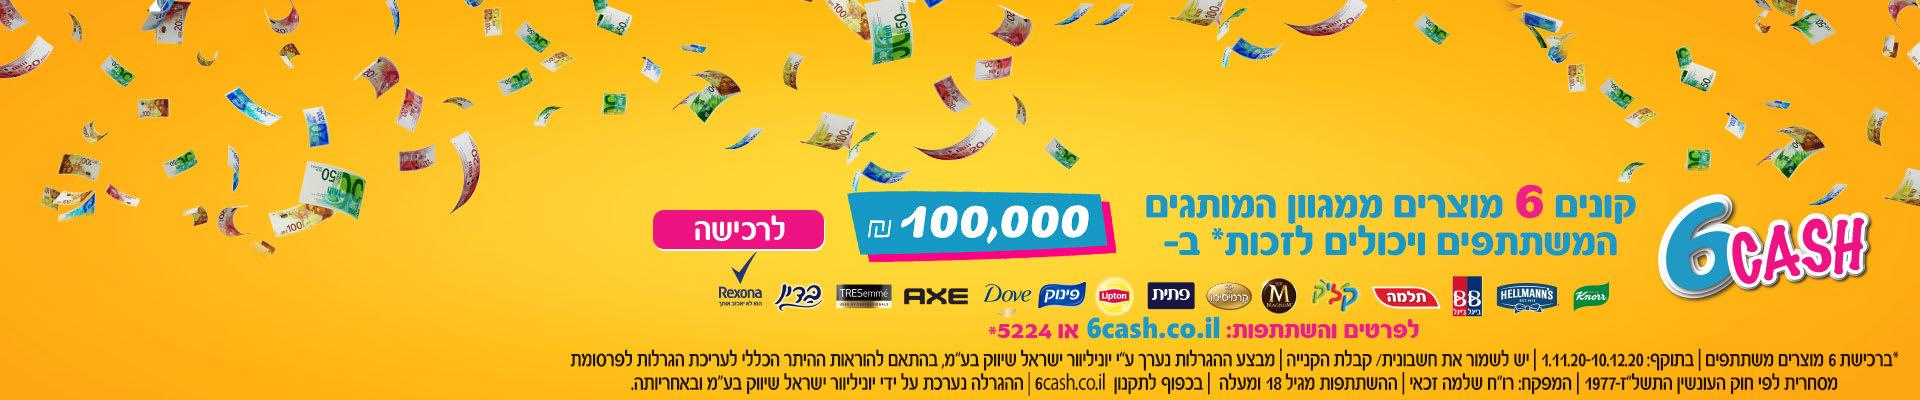 "6CASH קונים 6 מוצרים מהמגוון ויכולים לזכות* ב- 100,000 ₪ לרכישה לפרטים והשתתפות 6cash.co.il או 5224* בתוקף 1.11-10.12.20, יש לשמור את חשבונית הקנייה, המבצע נערך ע""י יוניליוור ישראל שיווק בע""מ,  ההשתתפות מגיל 18 ומעלה, בכפוף לתקנון"